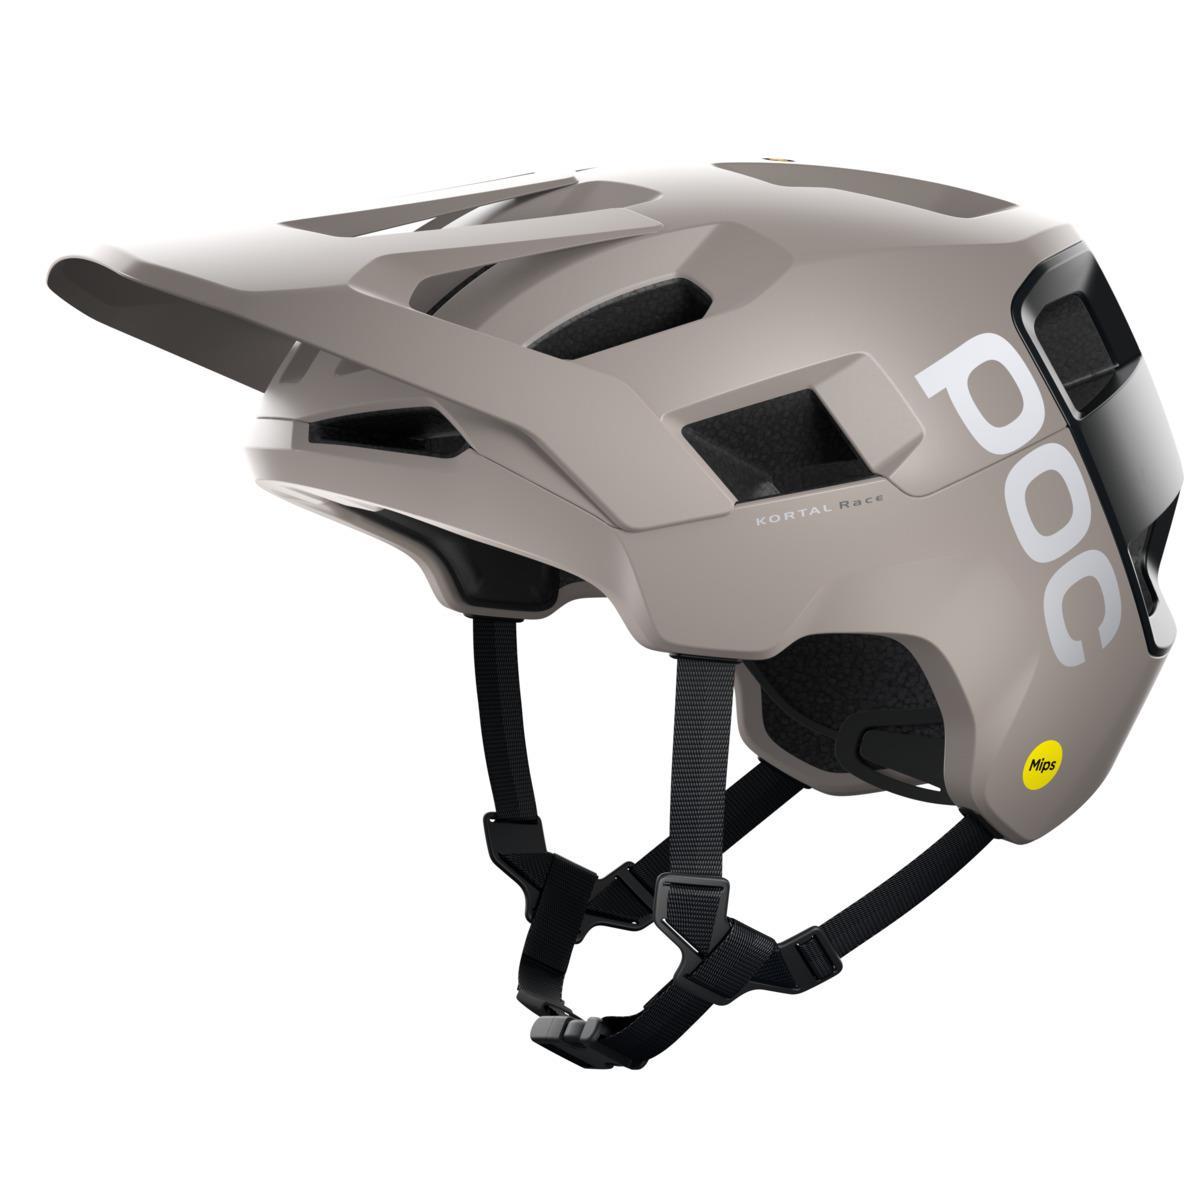 Helmet Kortal Race MIPS Moonstone Grey size XS-S (51-54)